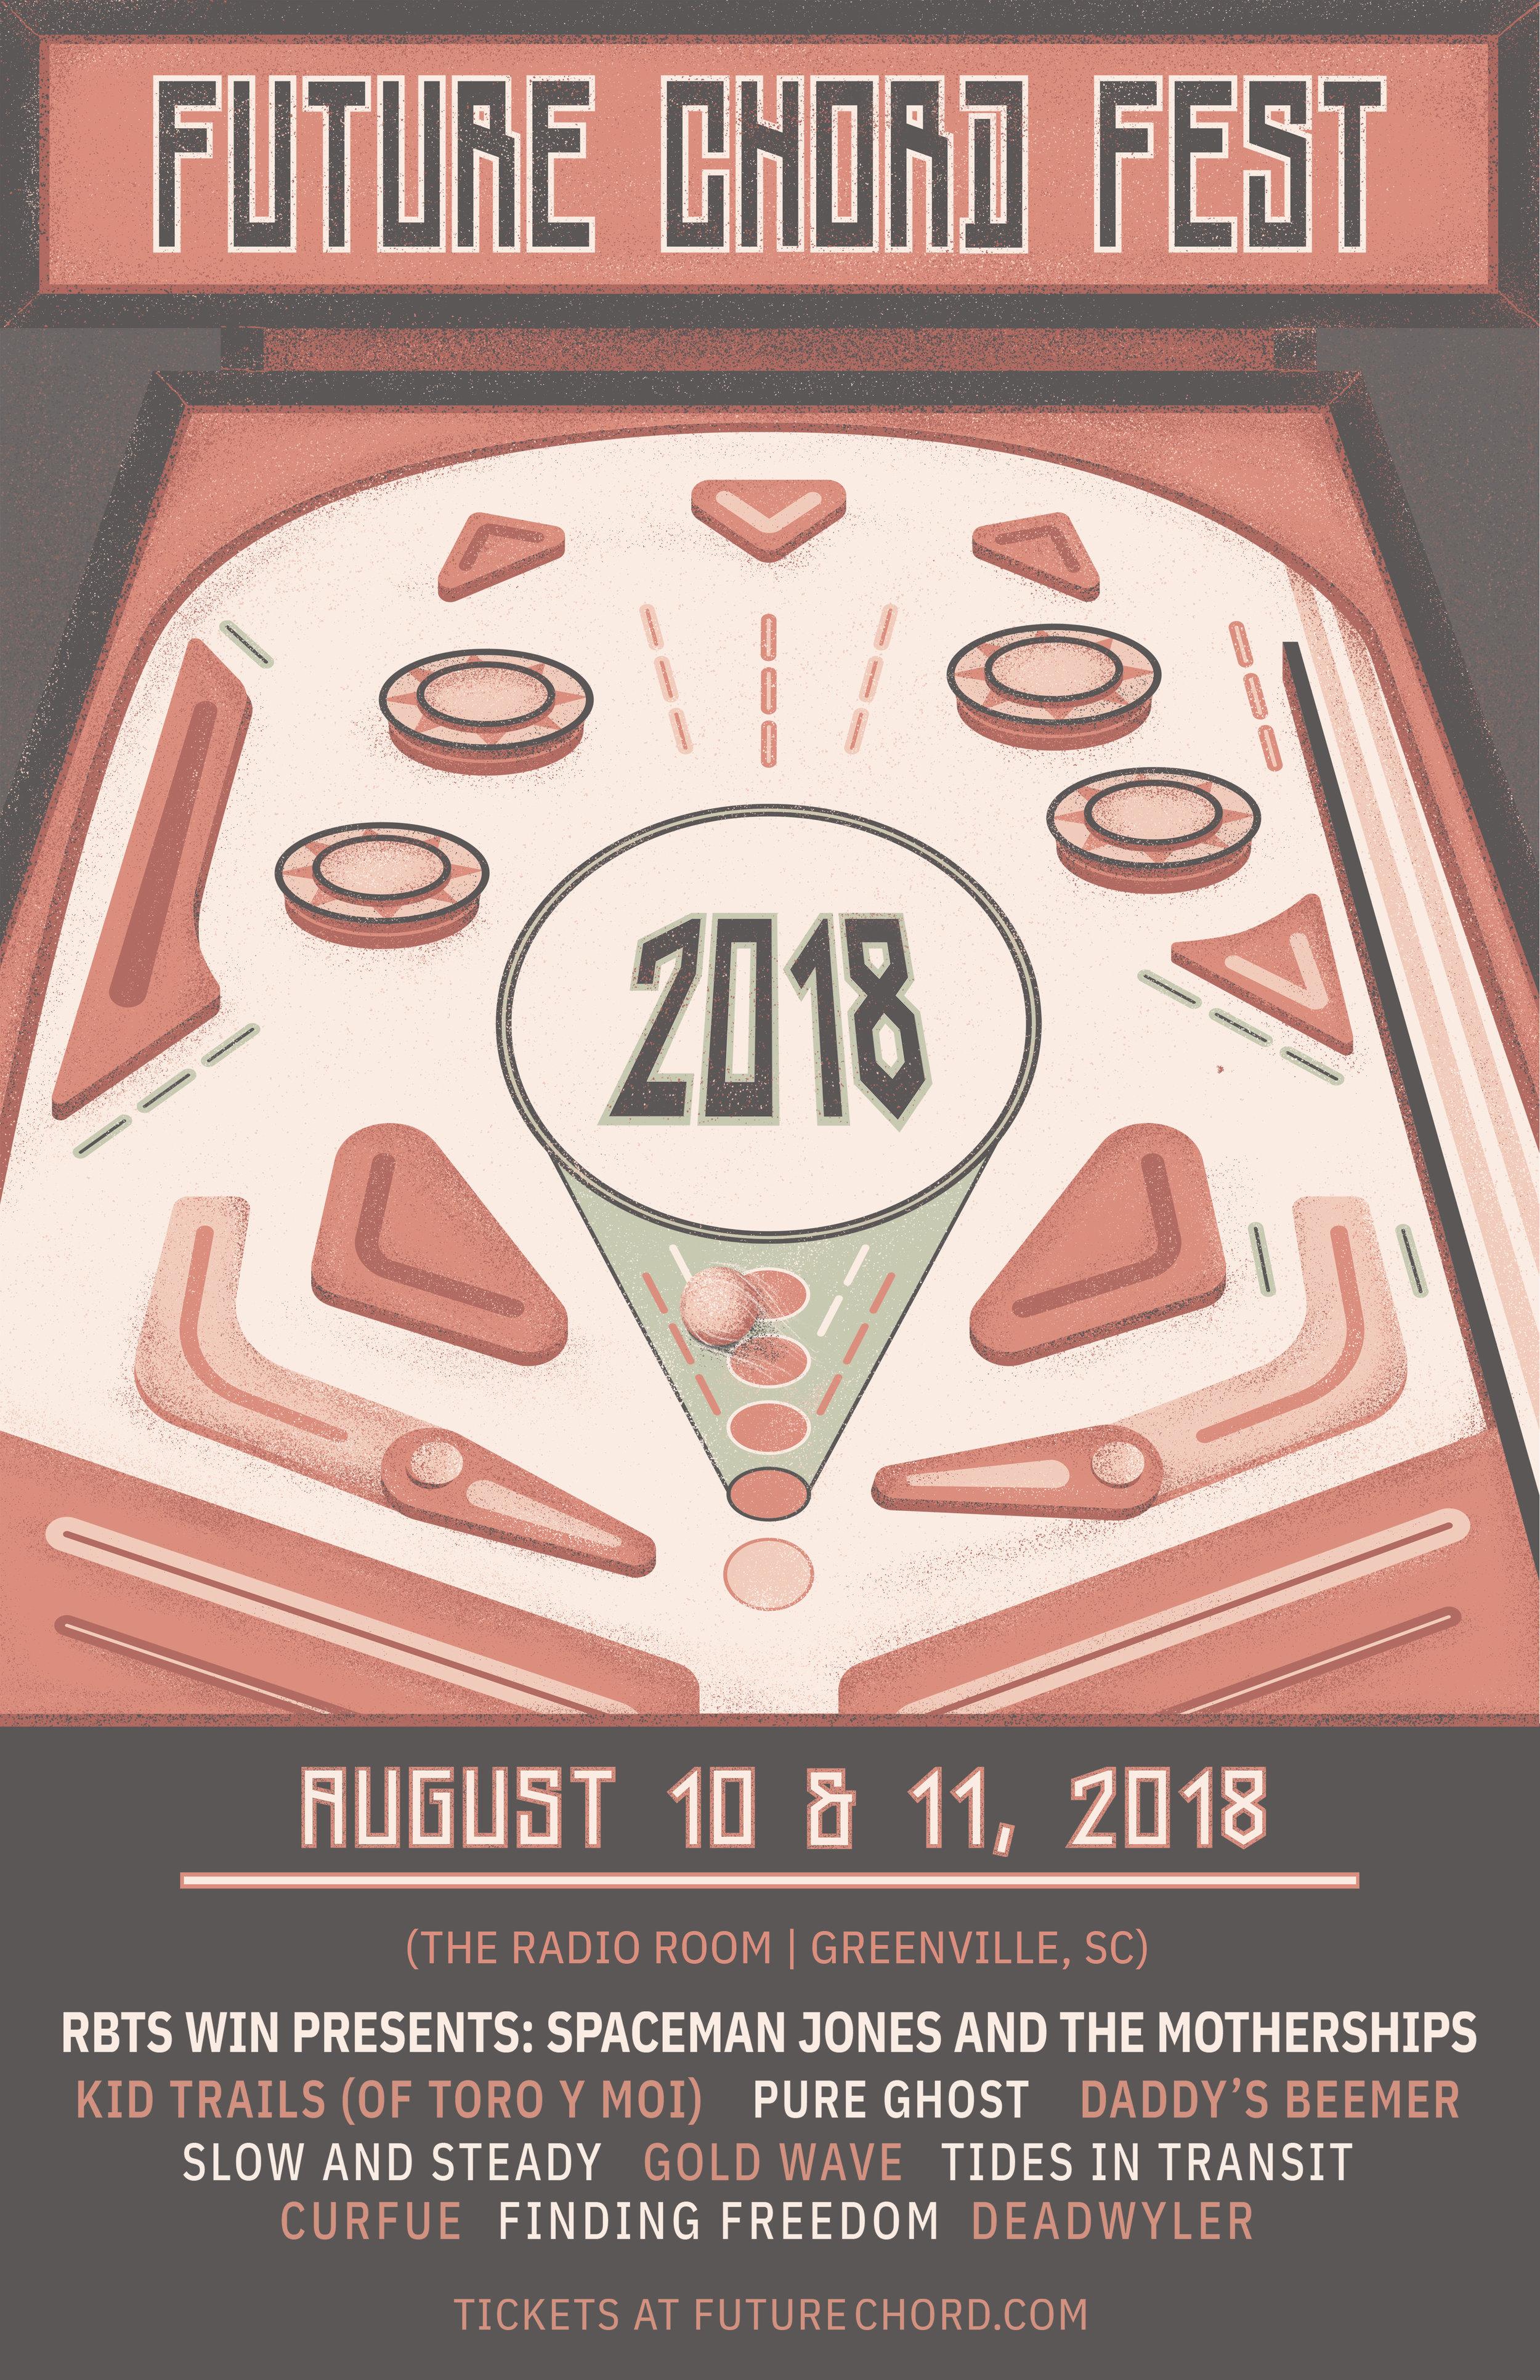 Future Chord Fest 2018 Poster.jpg